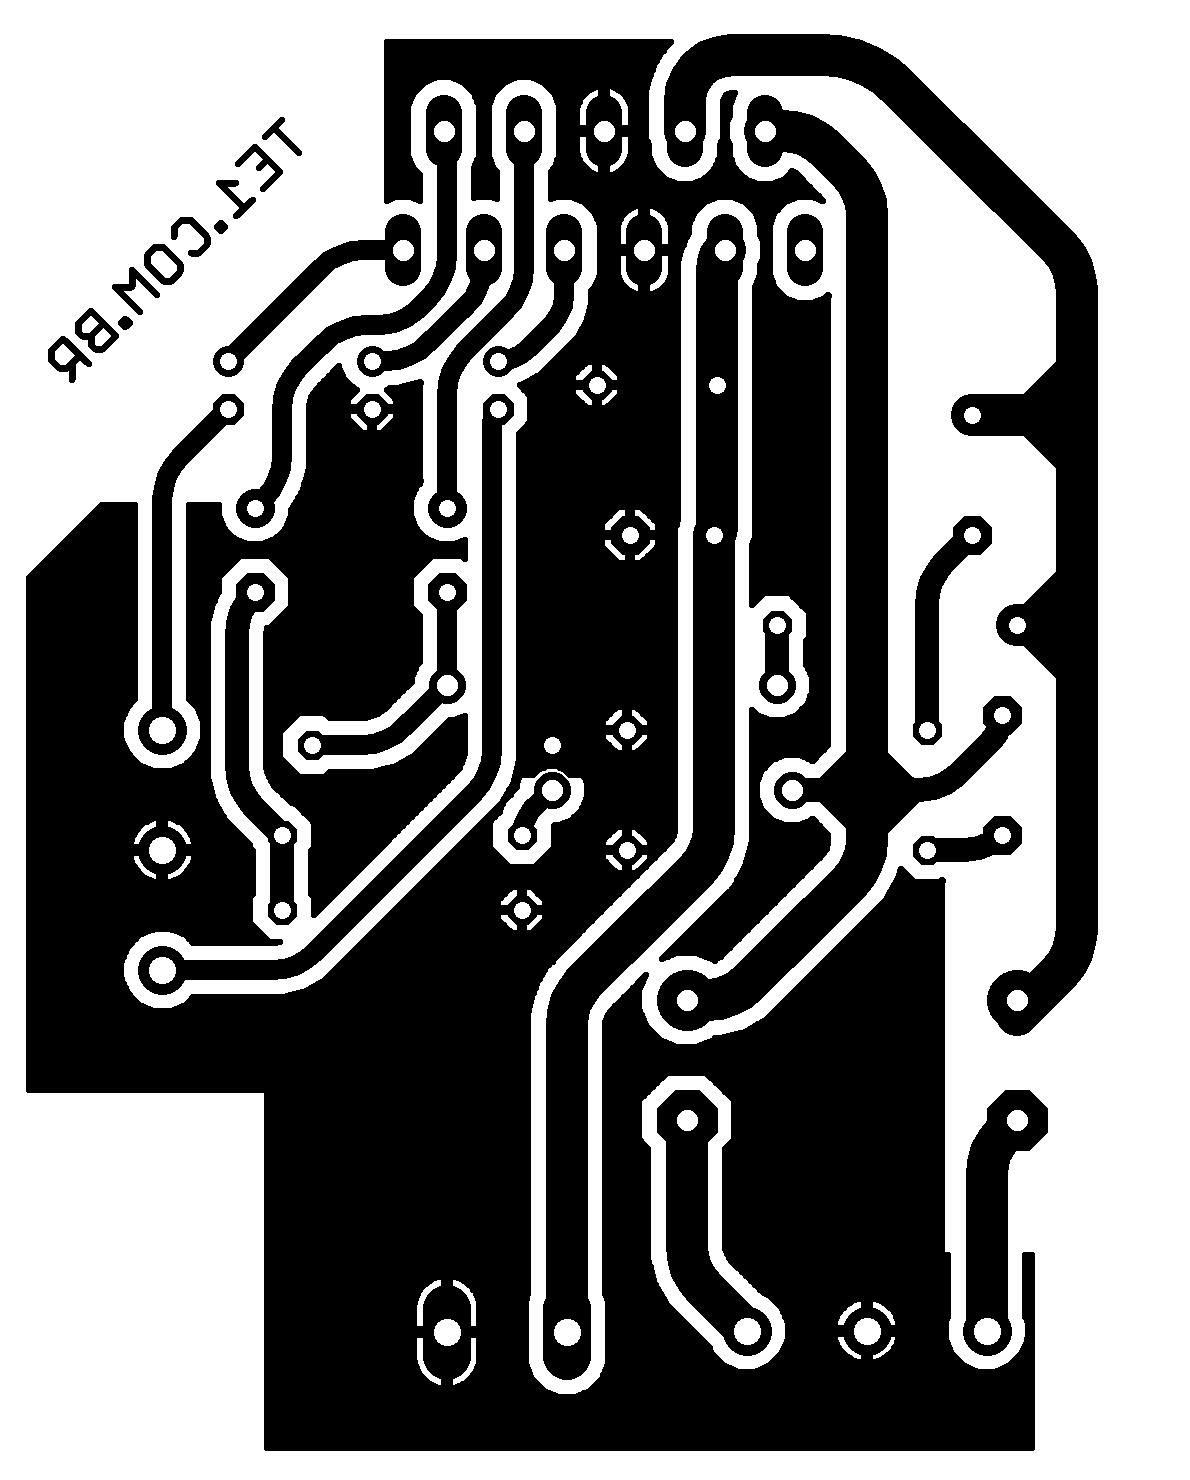 Toni Eletrnica One Circuitos E Informaes De Pgina 81 60 Watts Audio Amplifier Circuit Using Tda7296 Class Ab Tda2009 Stereo Pcb 700x799 Circuito Amplificador Potncia Estreo Com 2x 10w Tda